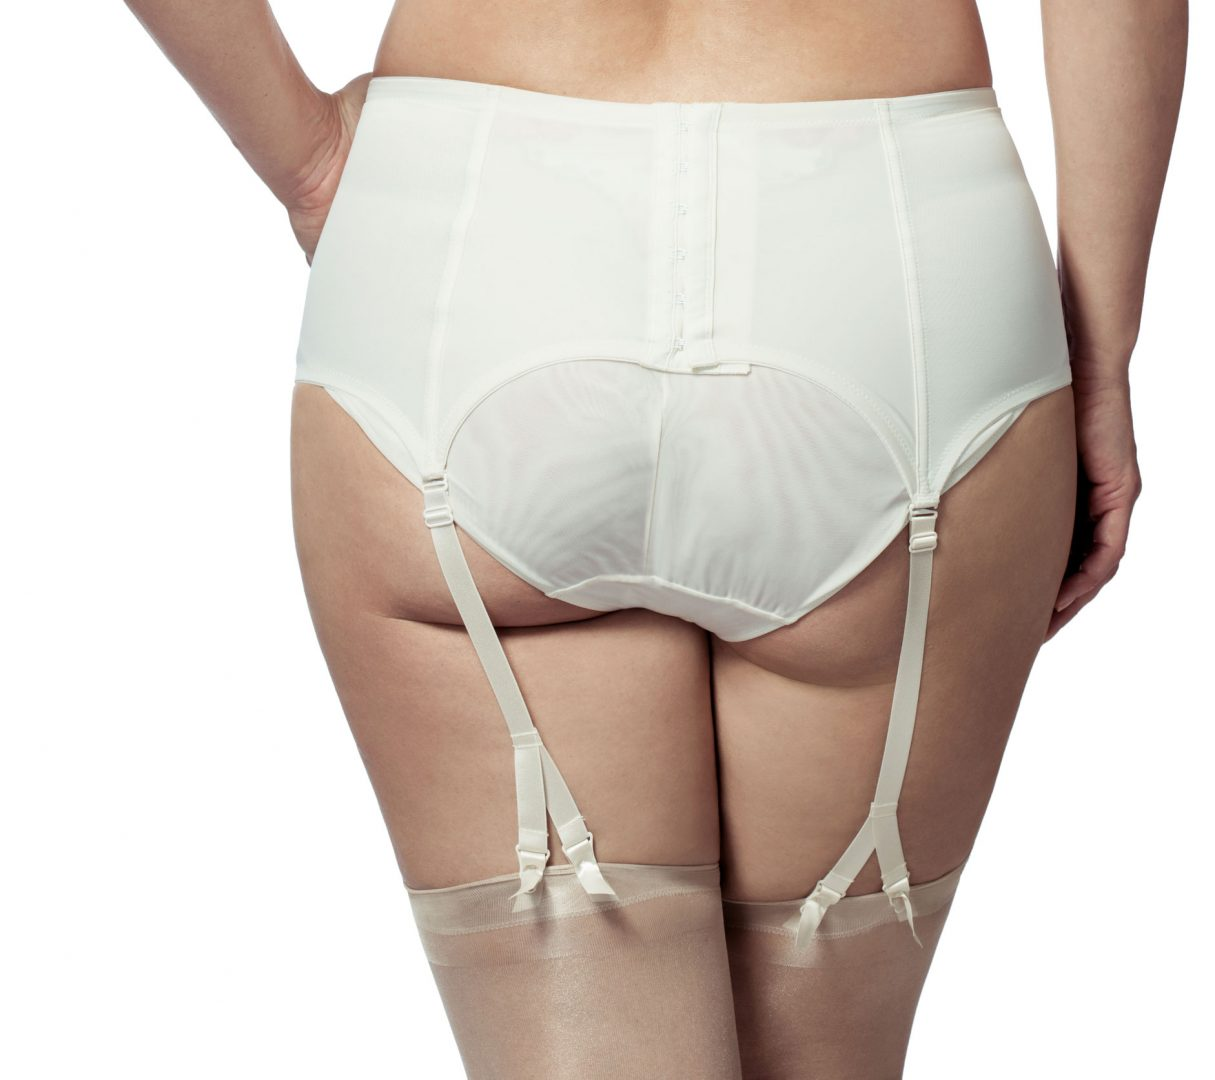 694347b038 Elila Glamour Embroidery Garter 9421. Elila 9421 Antique White-Close B